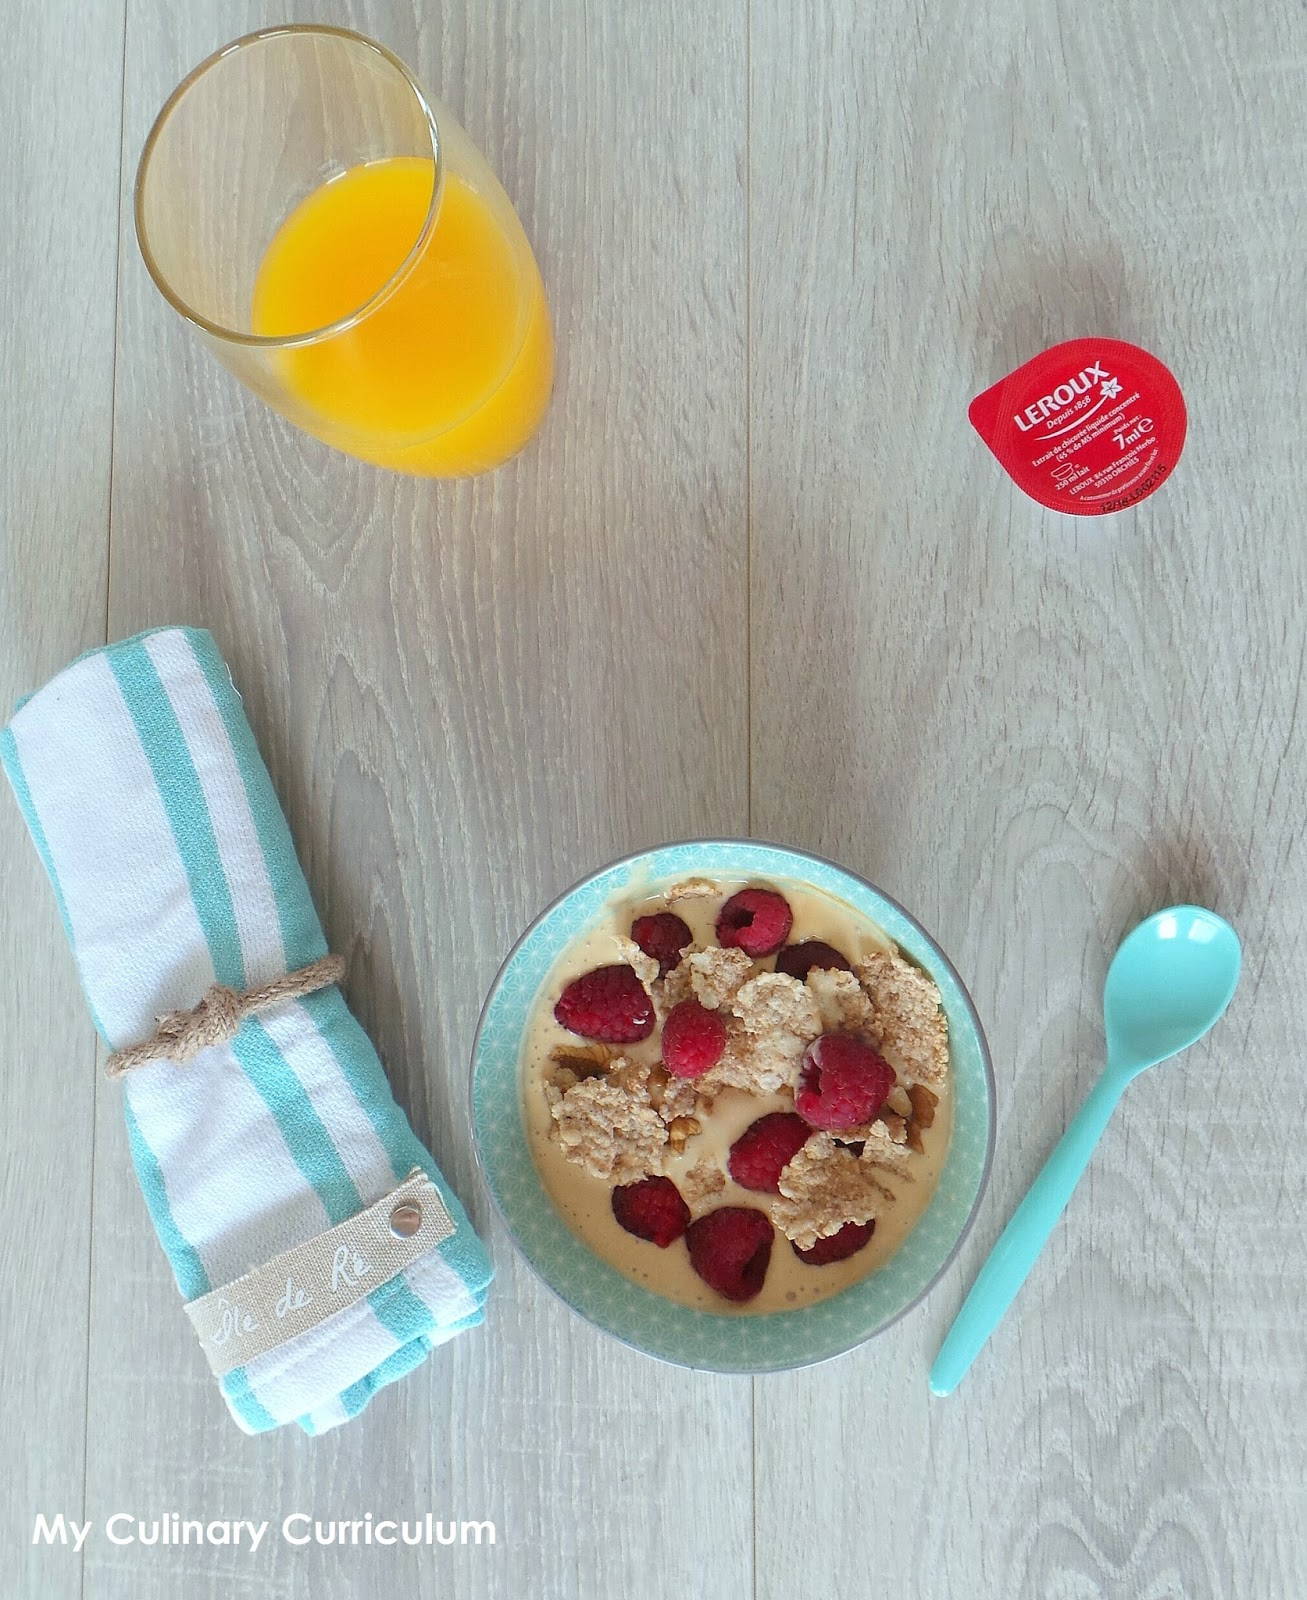 my culinary curriculum  yaourt glac u00e9  u00e0 la chicor u00e9e et